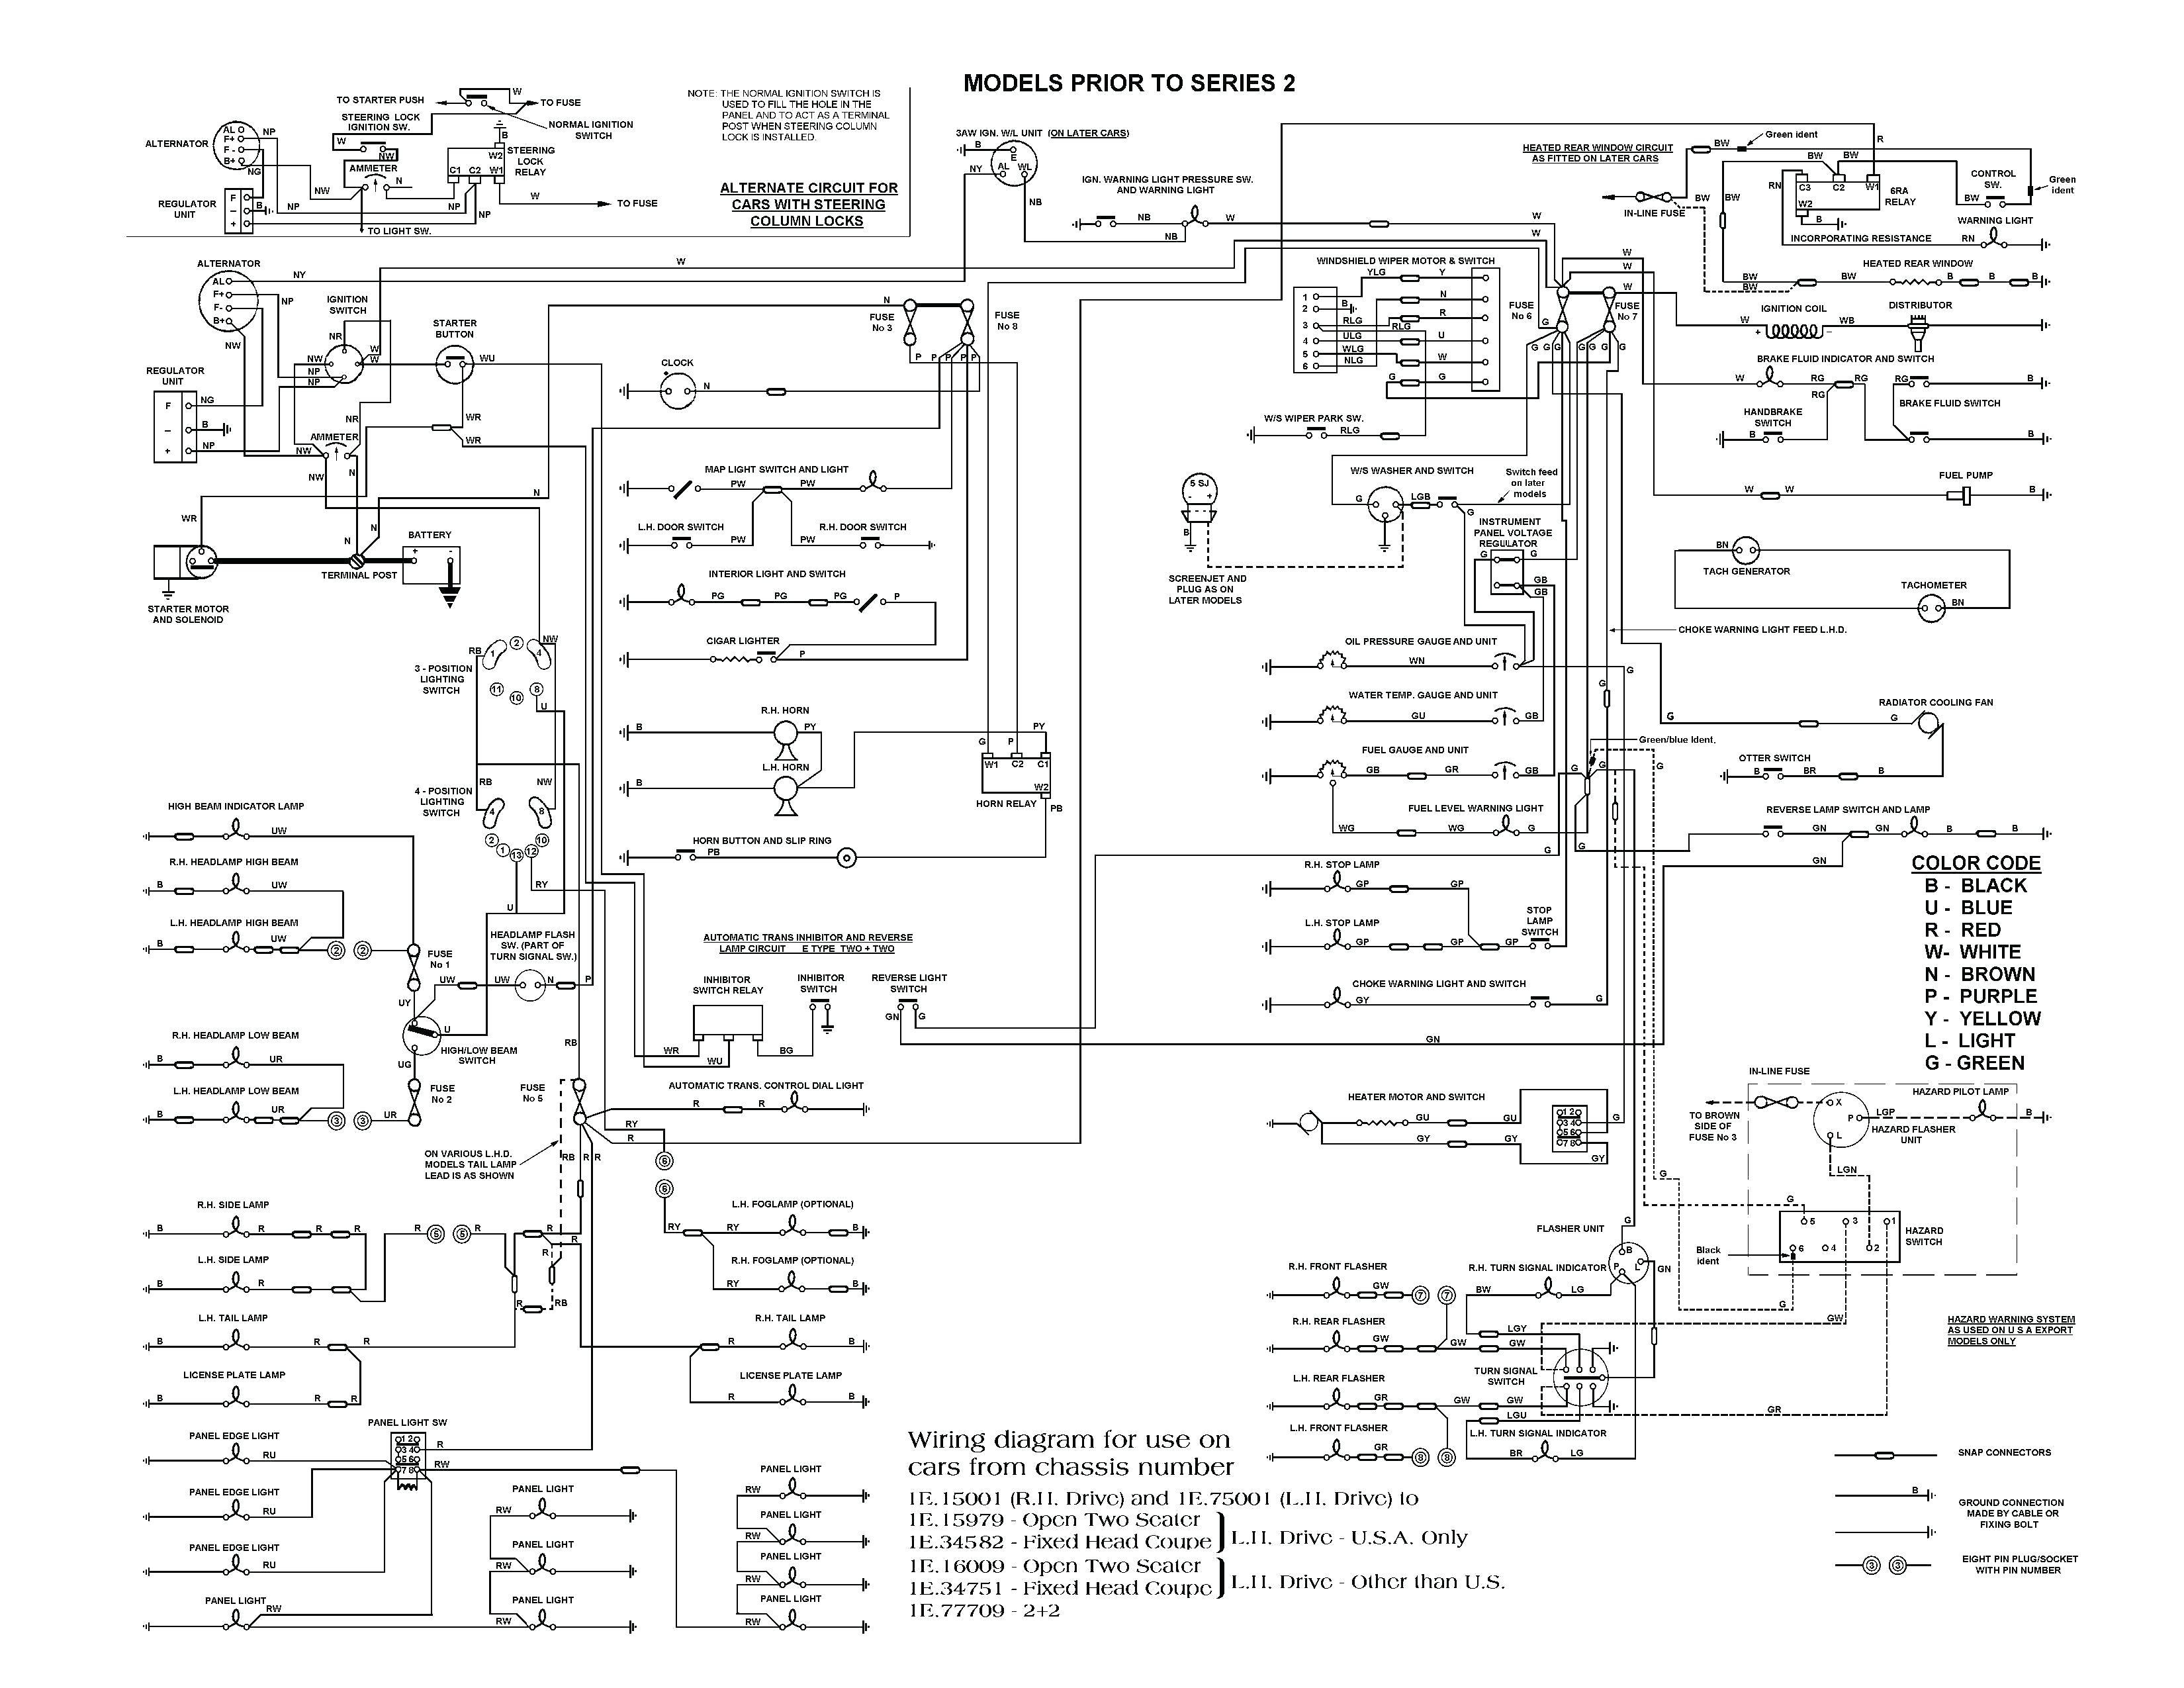 Peachy Jaguar X300 Wiring Diagram Wiring Diagram Data Wiring Cloud Waroletkolfr09Org